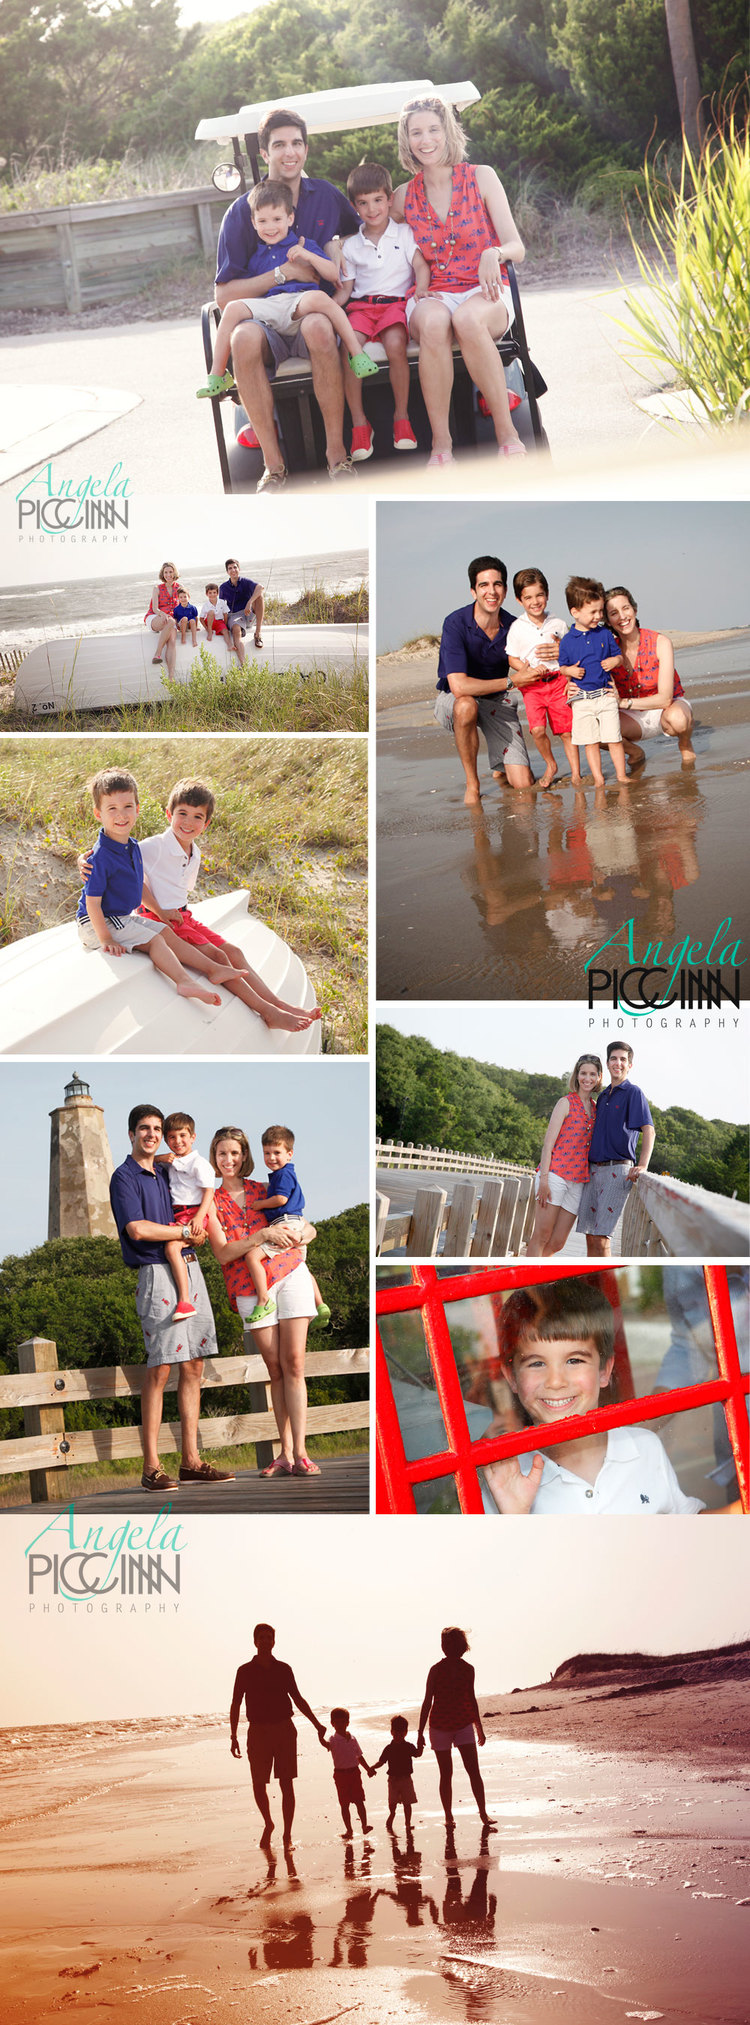 Bald Head Island Family Portraits by Angela Piccinin